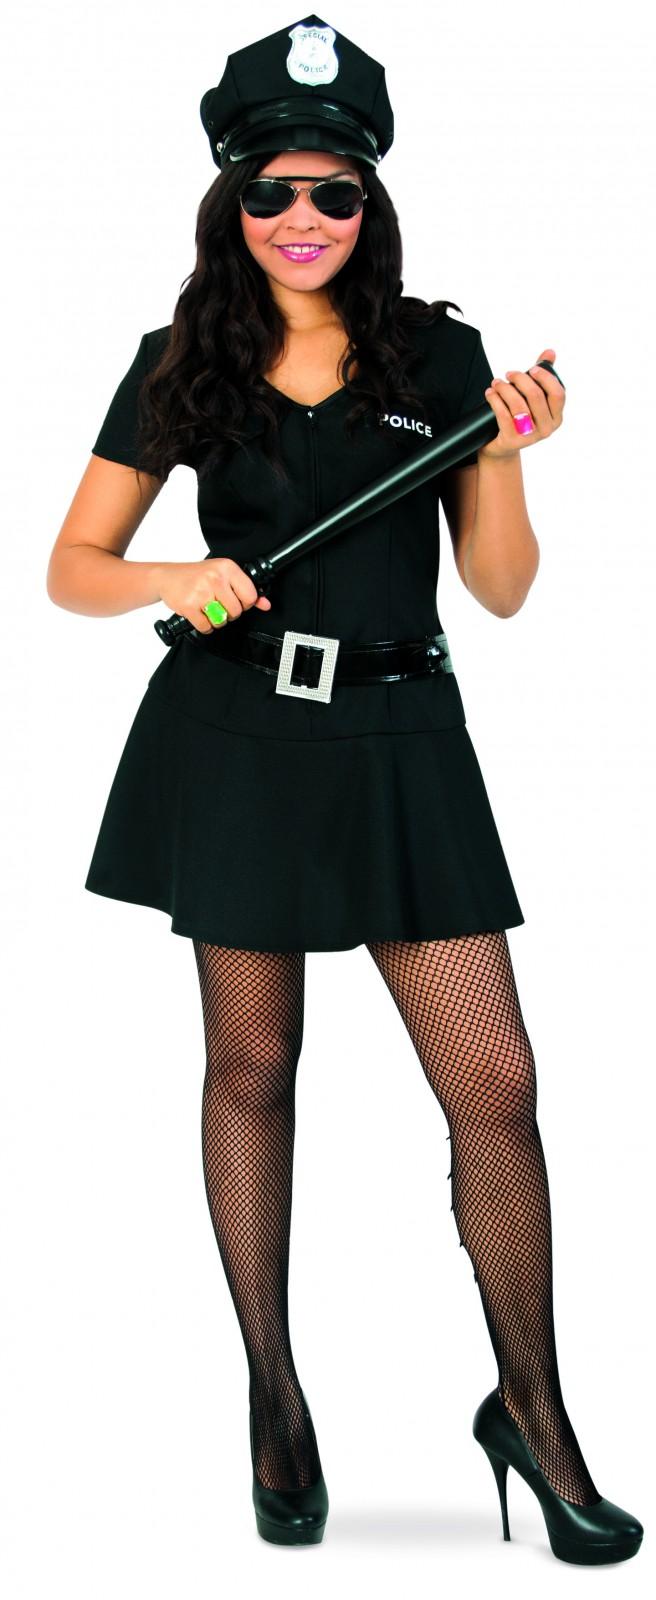 kinder kost m polizistin sexy police girl polizei. Black Bedroom Furniture Sets. Home Design Ideas